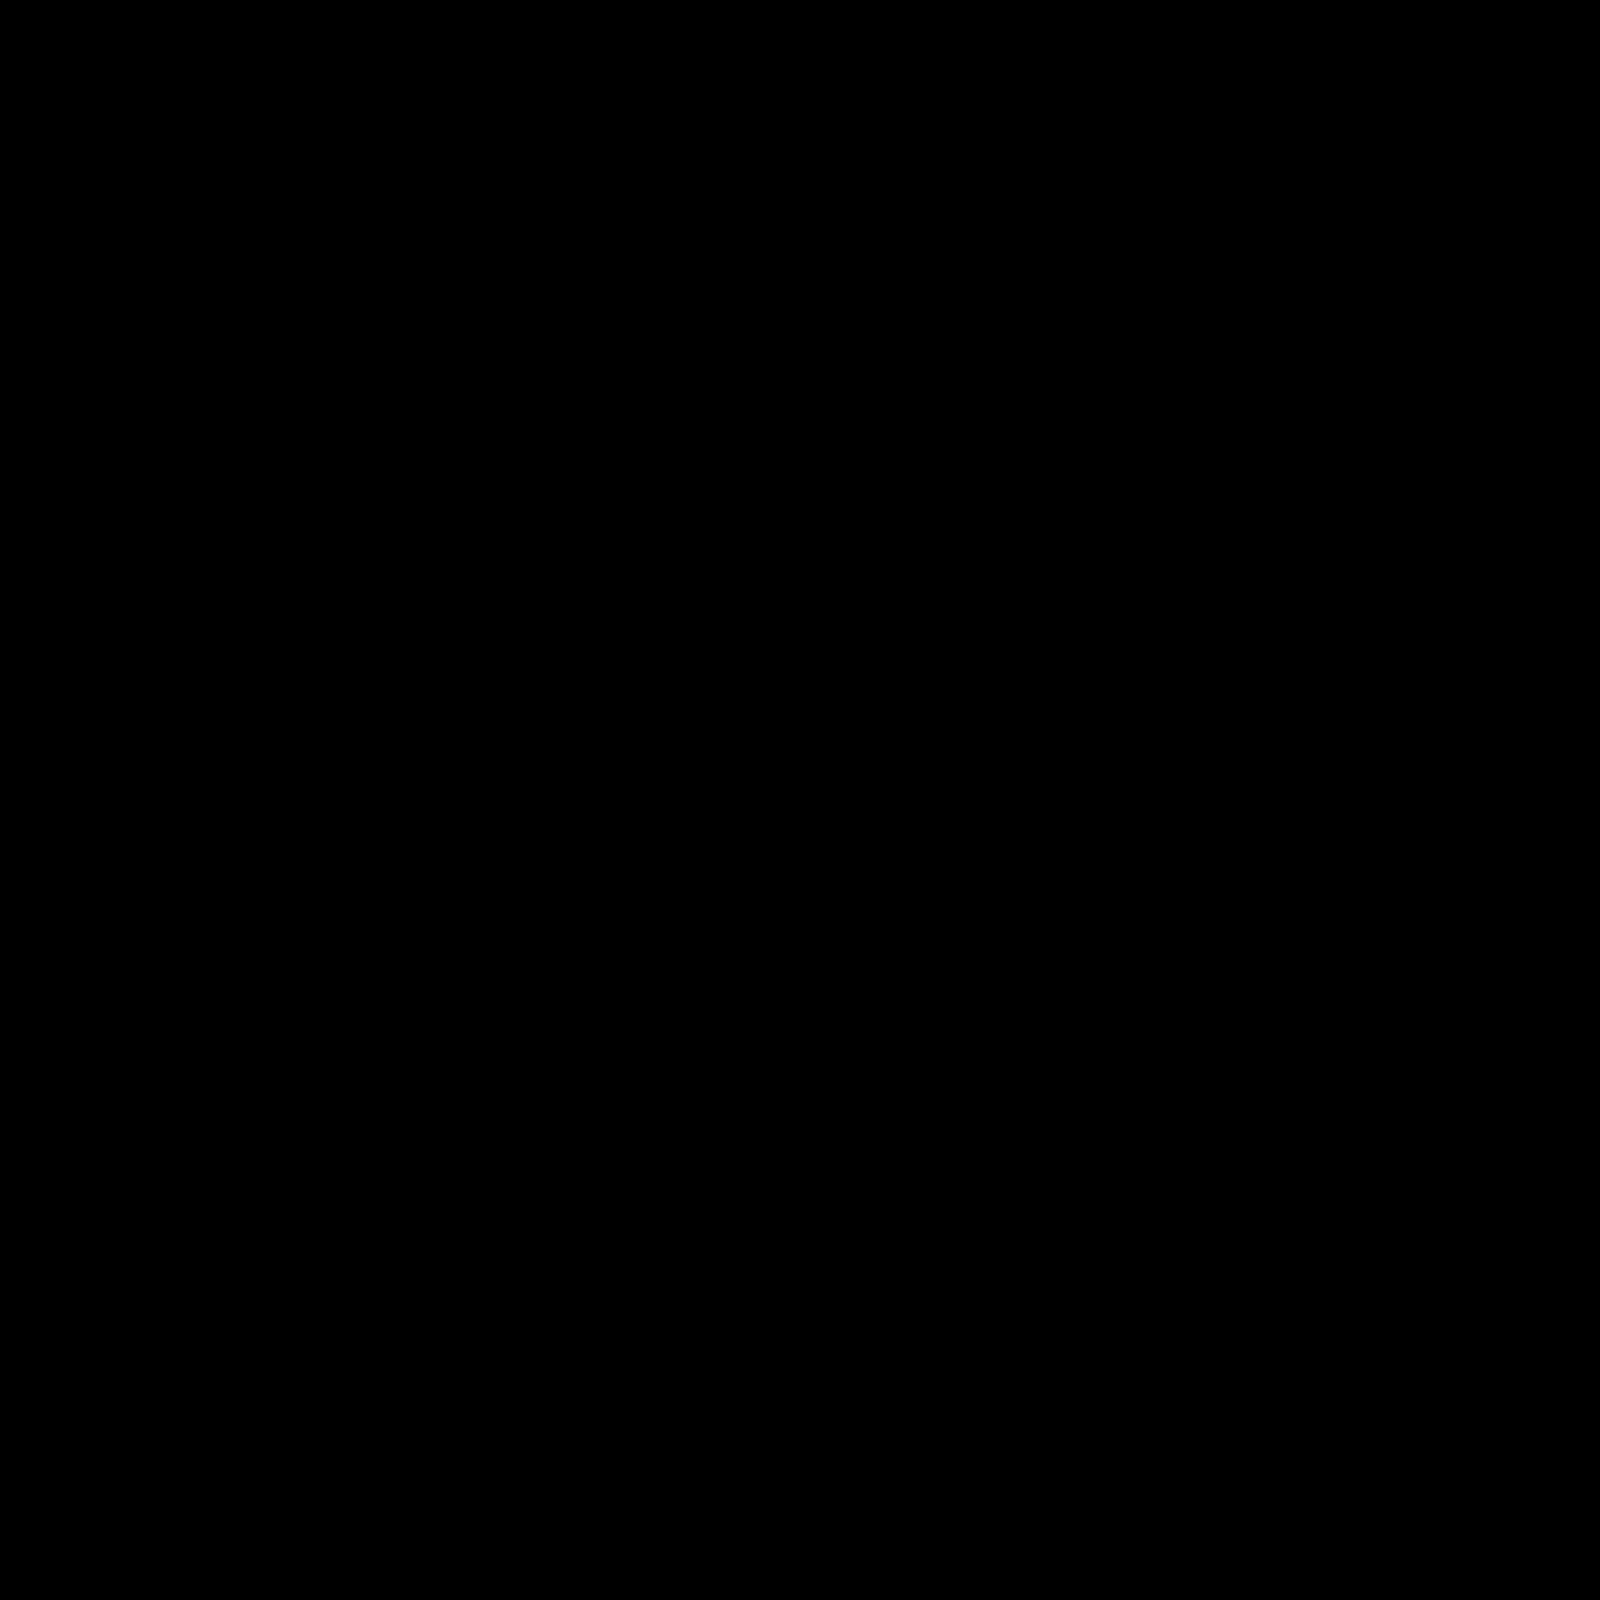 Closed Sign icon